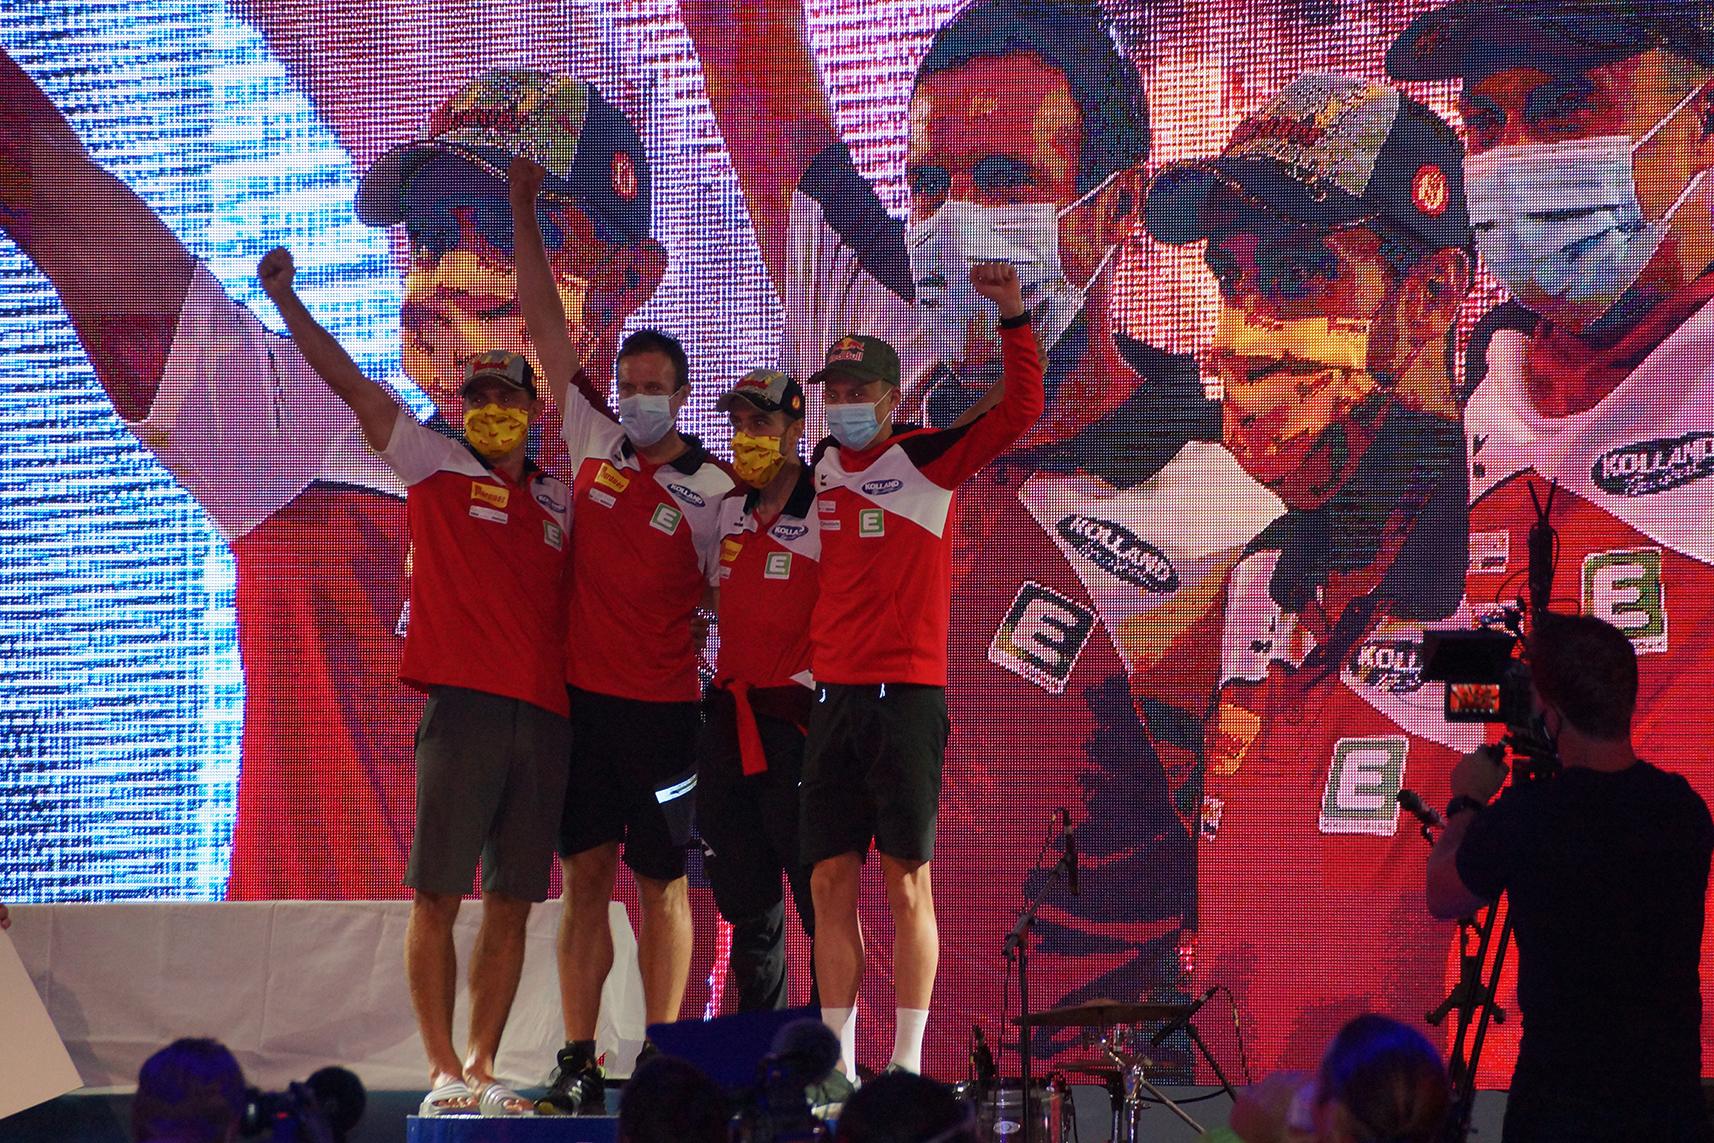 Dritter Sieg in Folge für Kolland Topsport Professional!